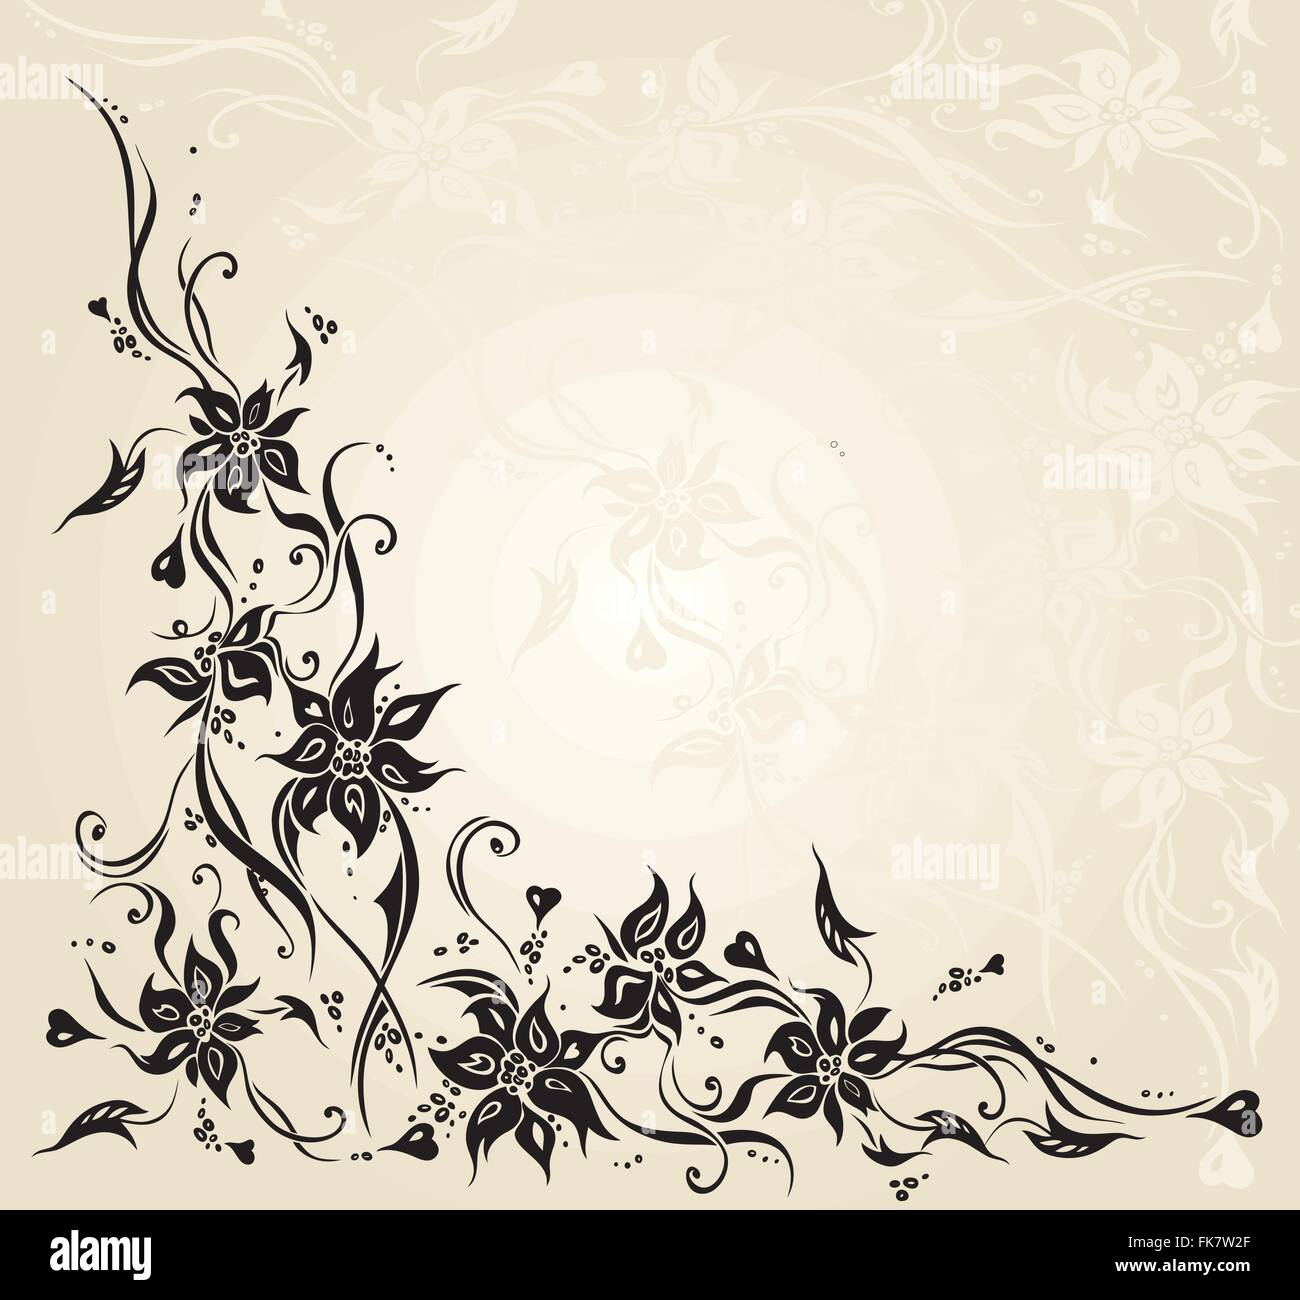 Ecru Vintage Floral Decorative Invitation Wedding Background